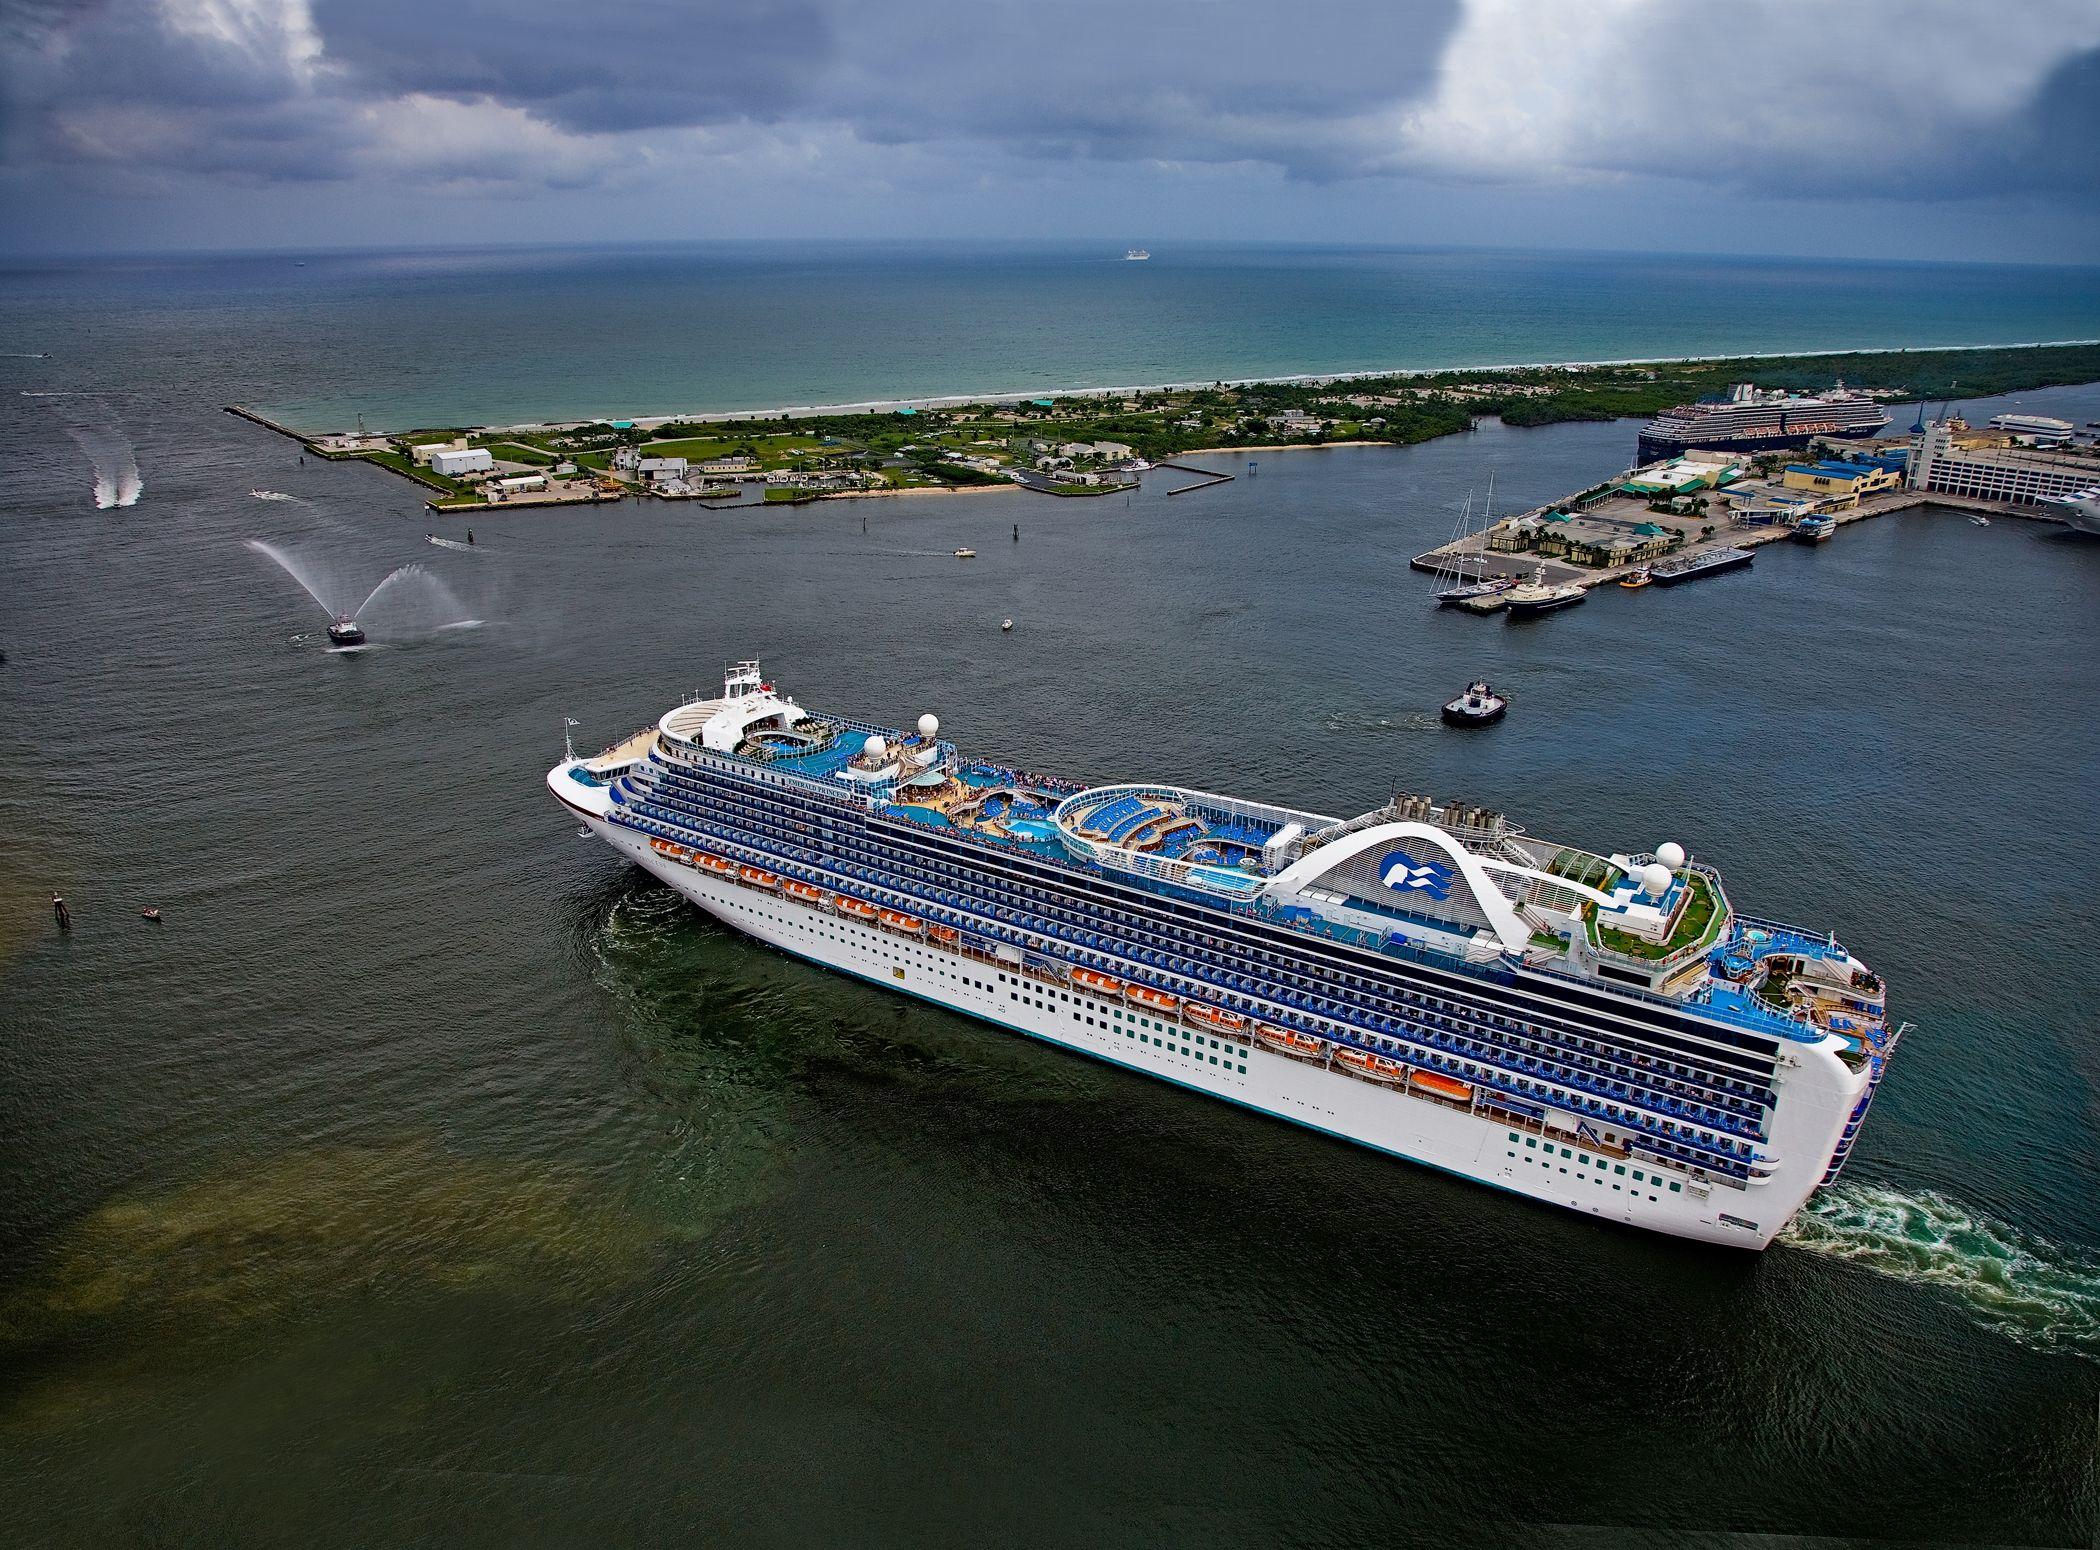 Emerald Princess starts its journey from Port Everglades